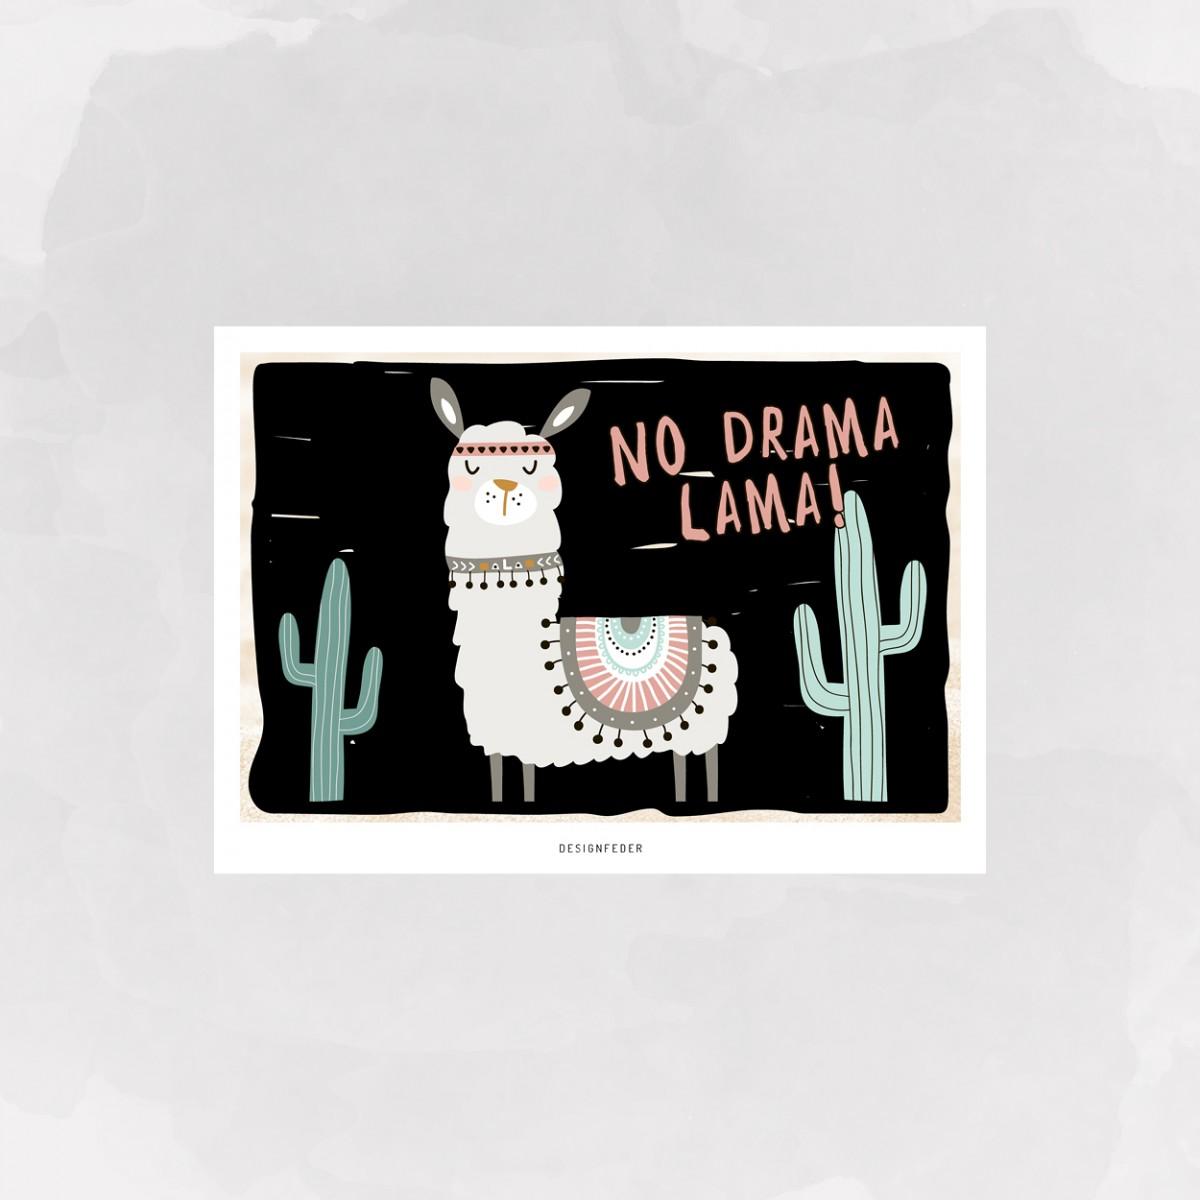 designfeder | Postkarte No Drama Lama